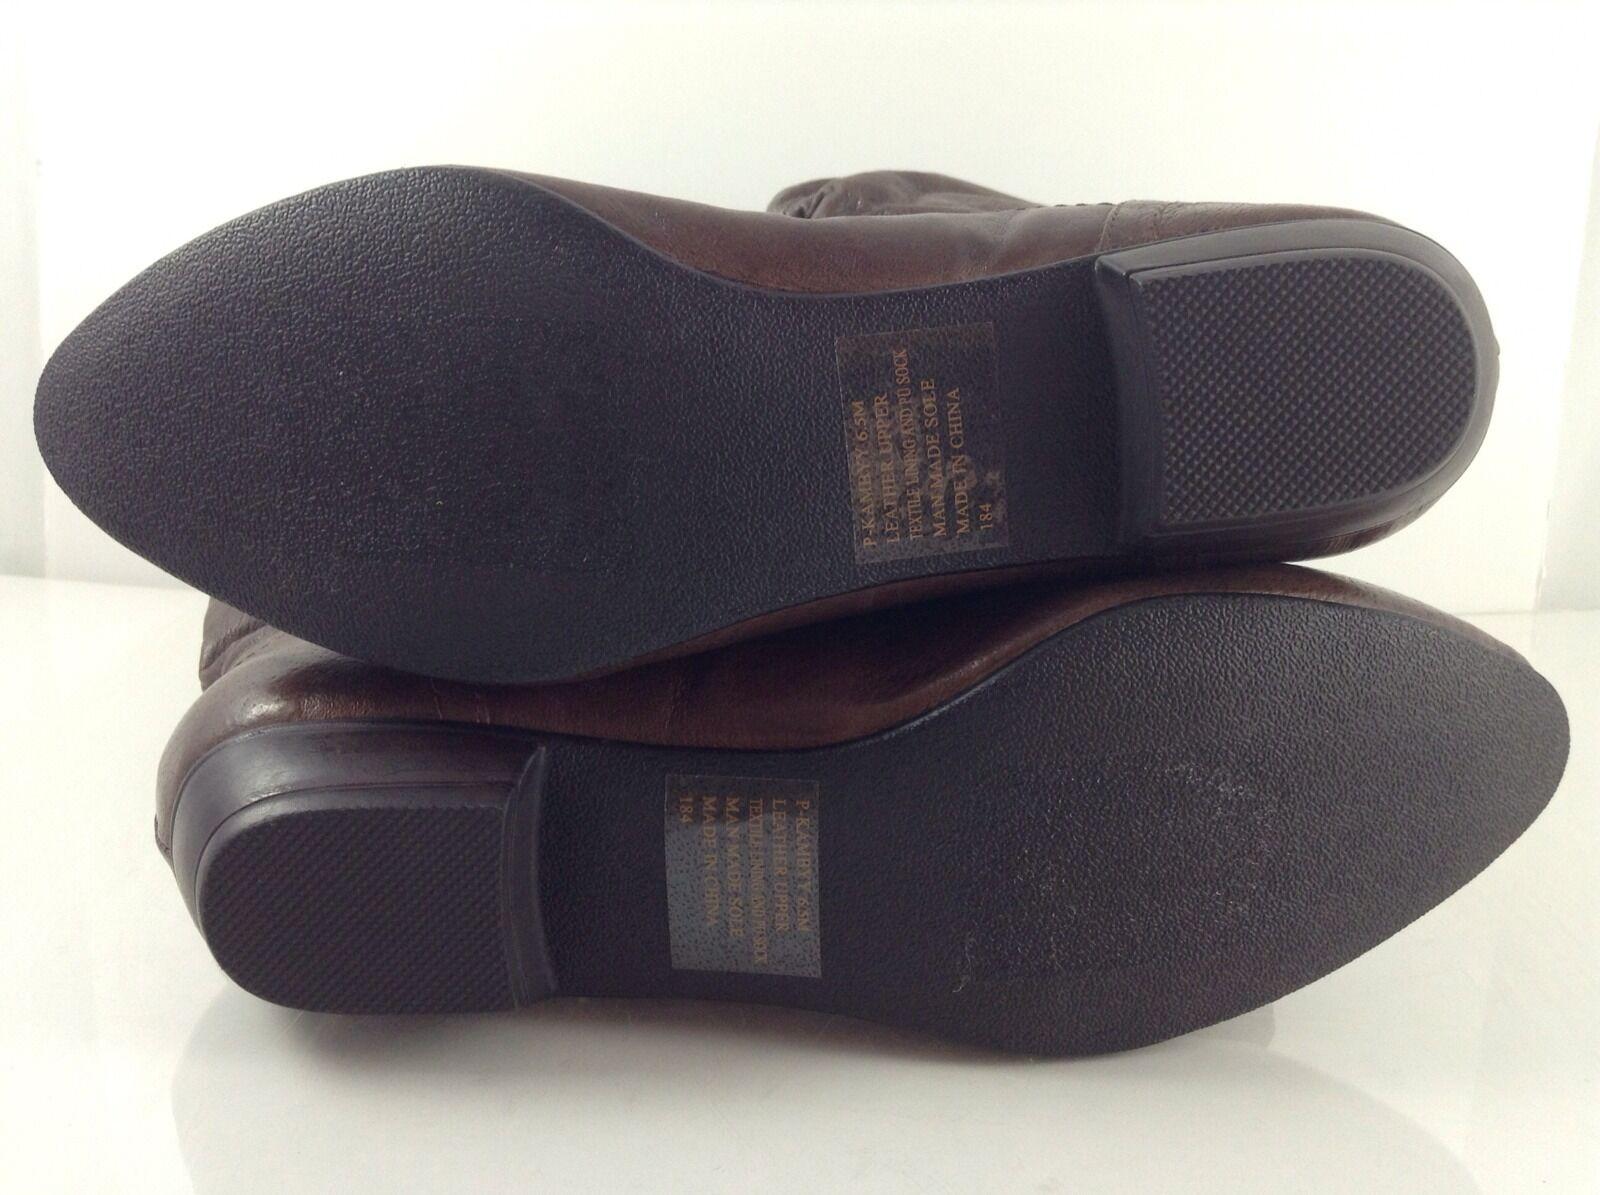 Steve Madden damen damen damen braun Leather Stiefel 6.5 M c4720a